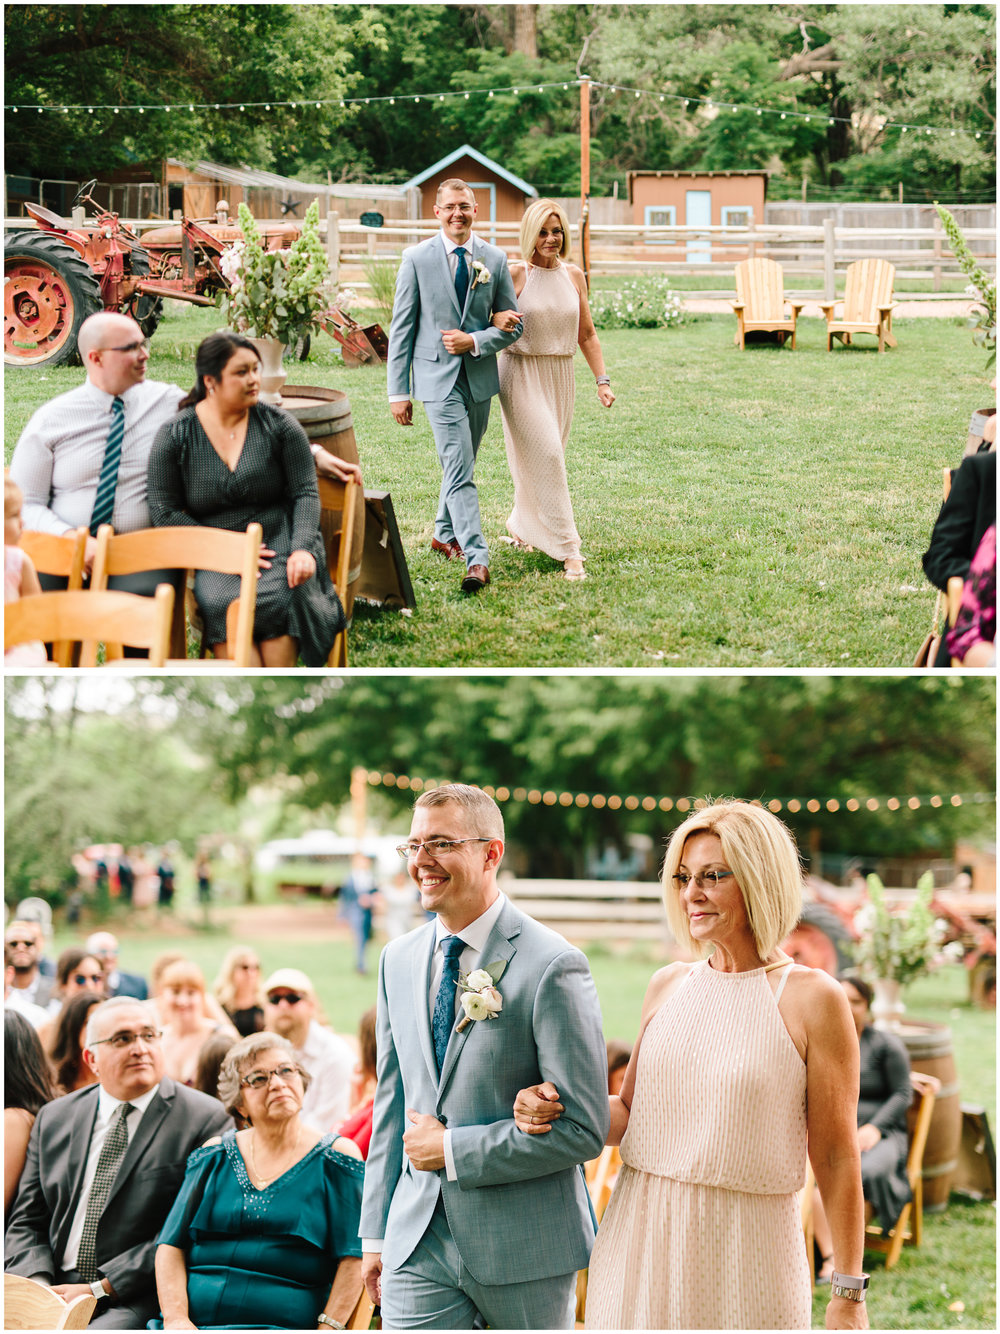 lyons_farmette_wedding_19.jpg